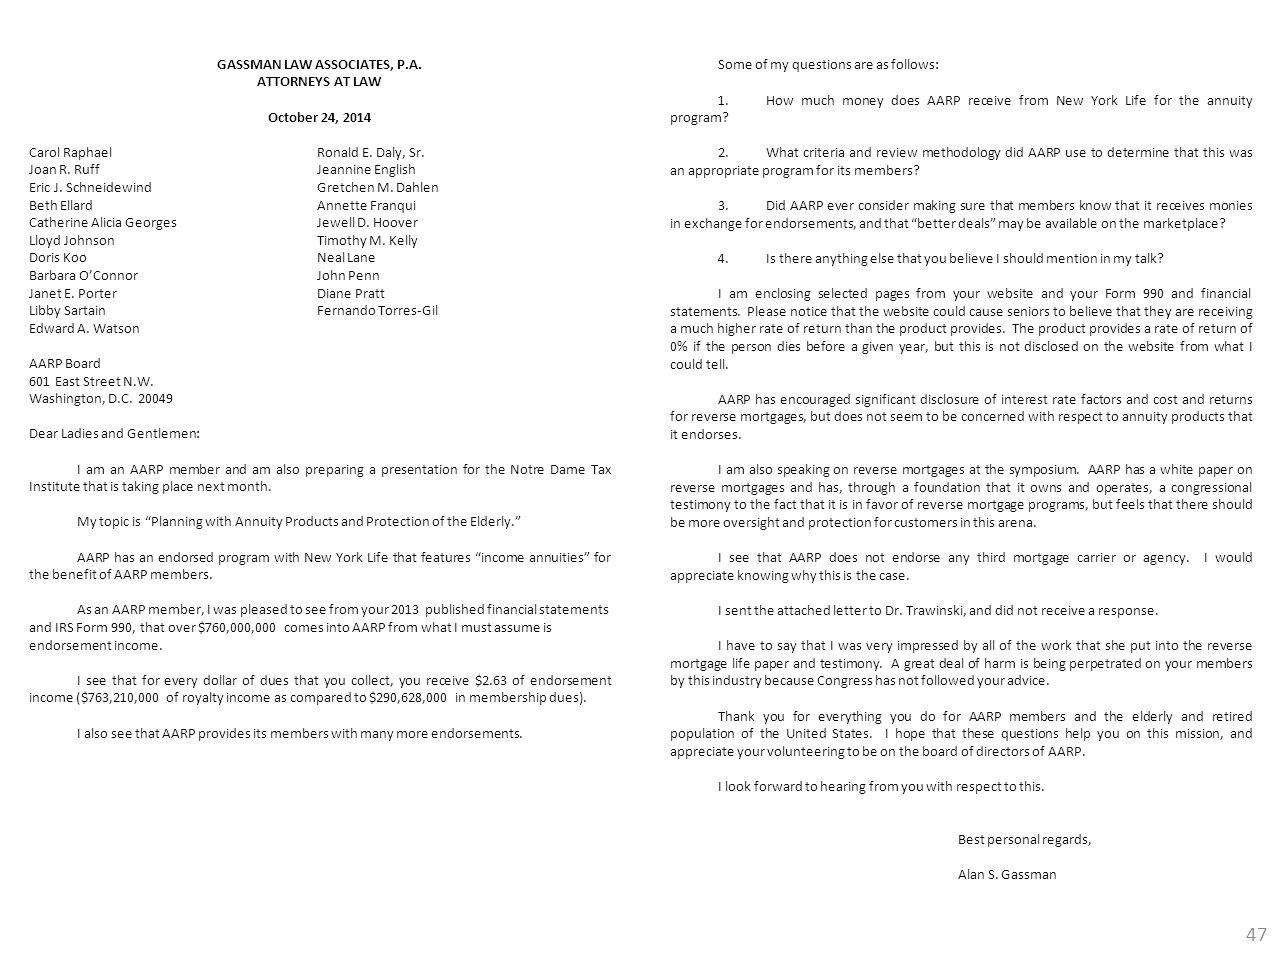 GASSMAN LAW ASSOCIATES, P.A. ATTORNEYS AT LAW October 24, 2014 Carol RaphaelRonald E. Daly, Sr. Joan R. RuffJeannine English Eric J. SchneidewindGretc